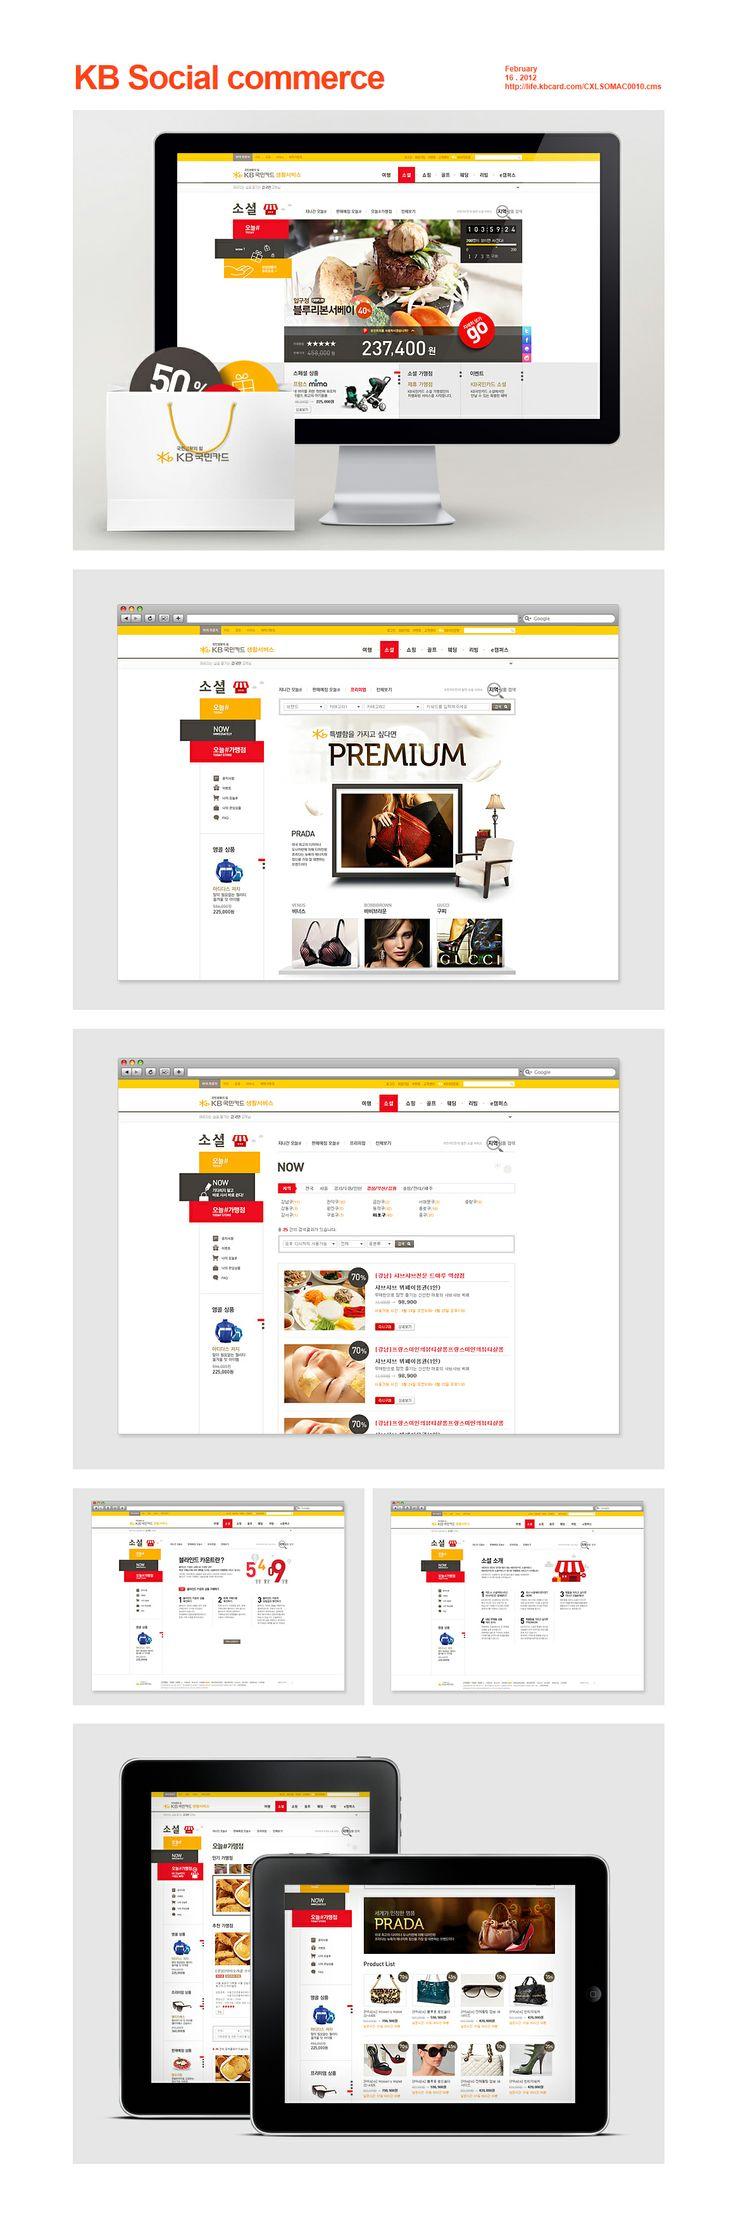 [KB Social commerce - Life plaza] Life plaza site는 국민은행의 소셜 비즈니를 확대를 위한 소셜 커머스(Social Commerce)사이트입니다. 소셜커머스 출시와 함께 위치기반서비스(LBS)를 이용한 모바일 앱을 제공함으로써 고객과 쌍방향 마케팅 활용에 기여하였으며 또한 SNS서비스구축하면서 사용자의 신속한 상호 의사소통을 가능케하는 사이트를 구축하였습니다. - February 16 . 2012